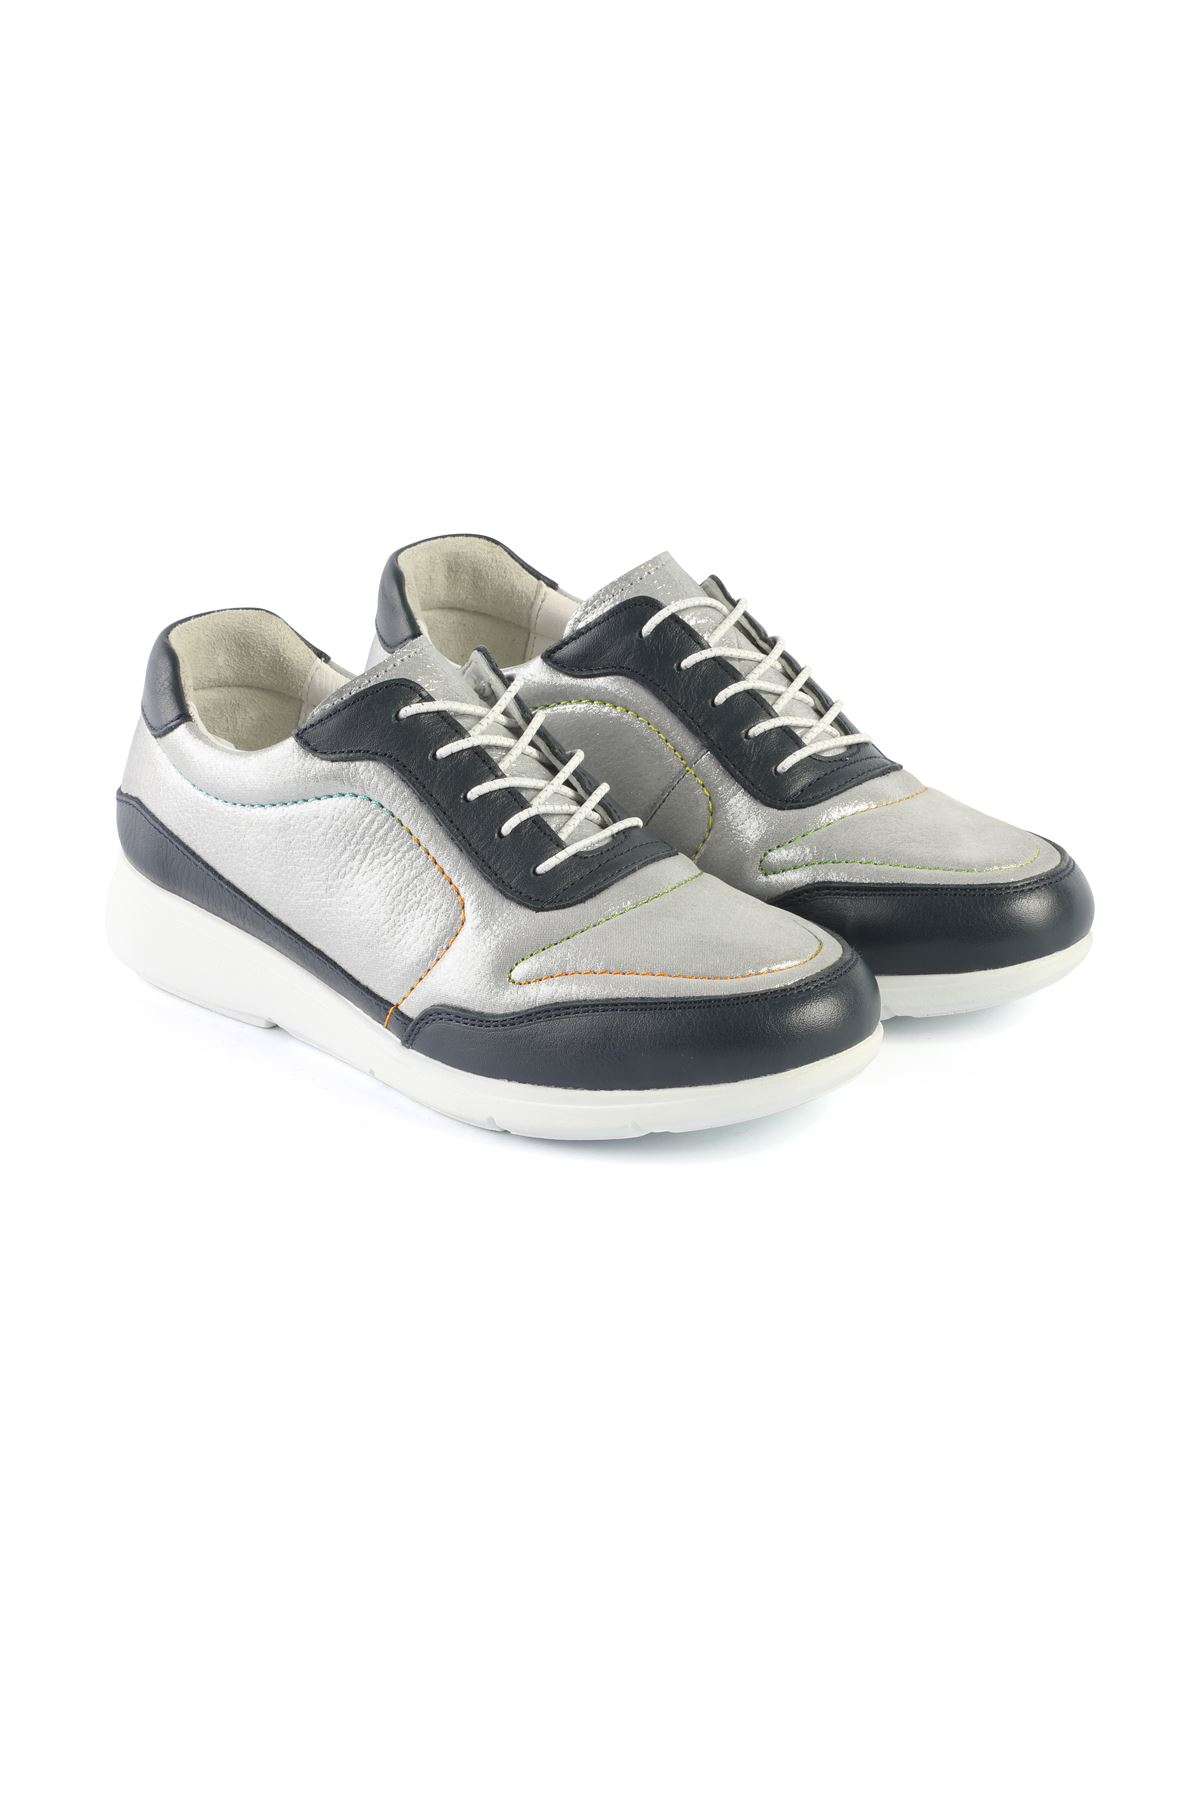 Libero AE0082 Silver Sport Shoes